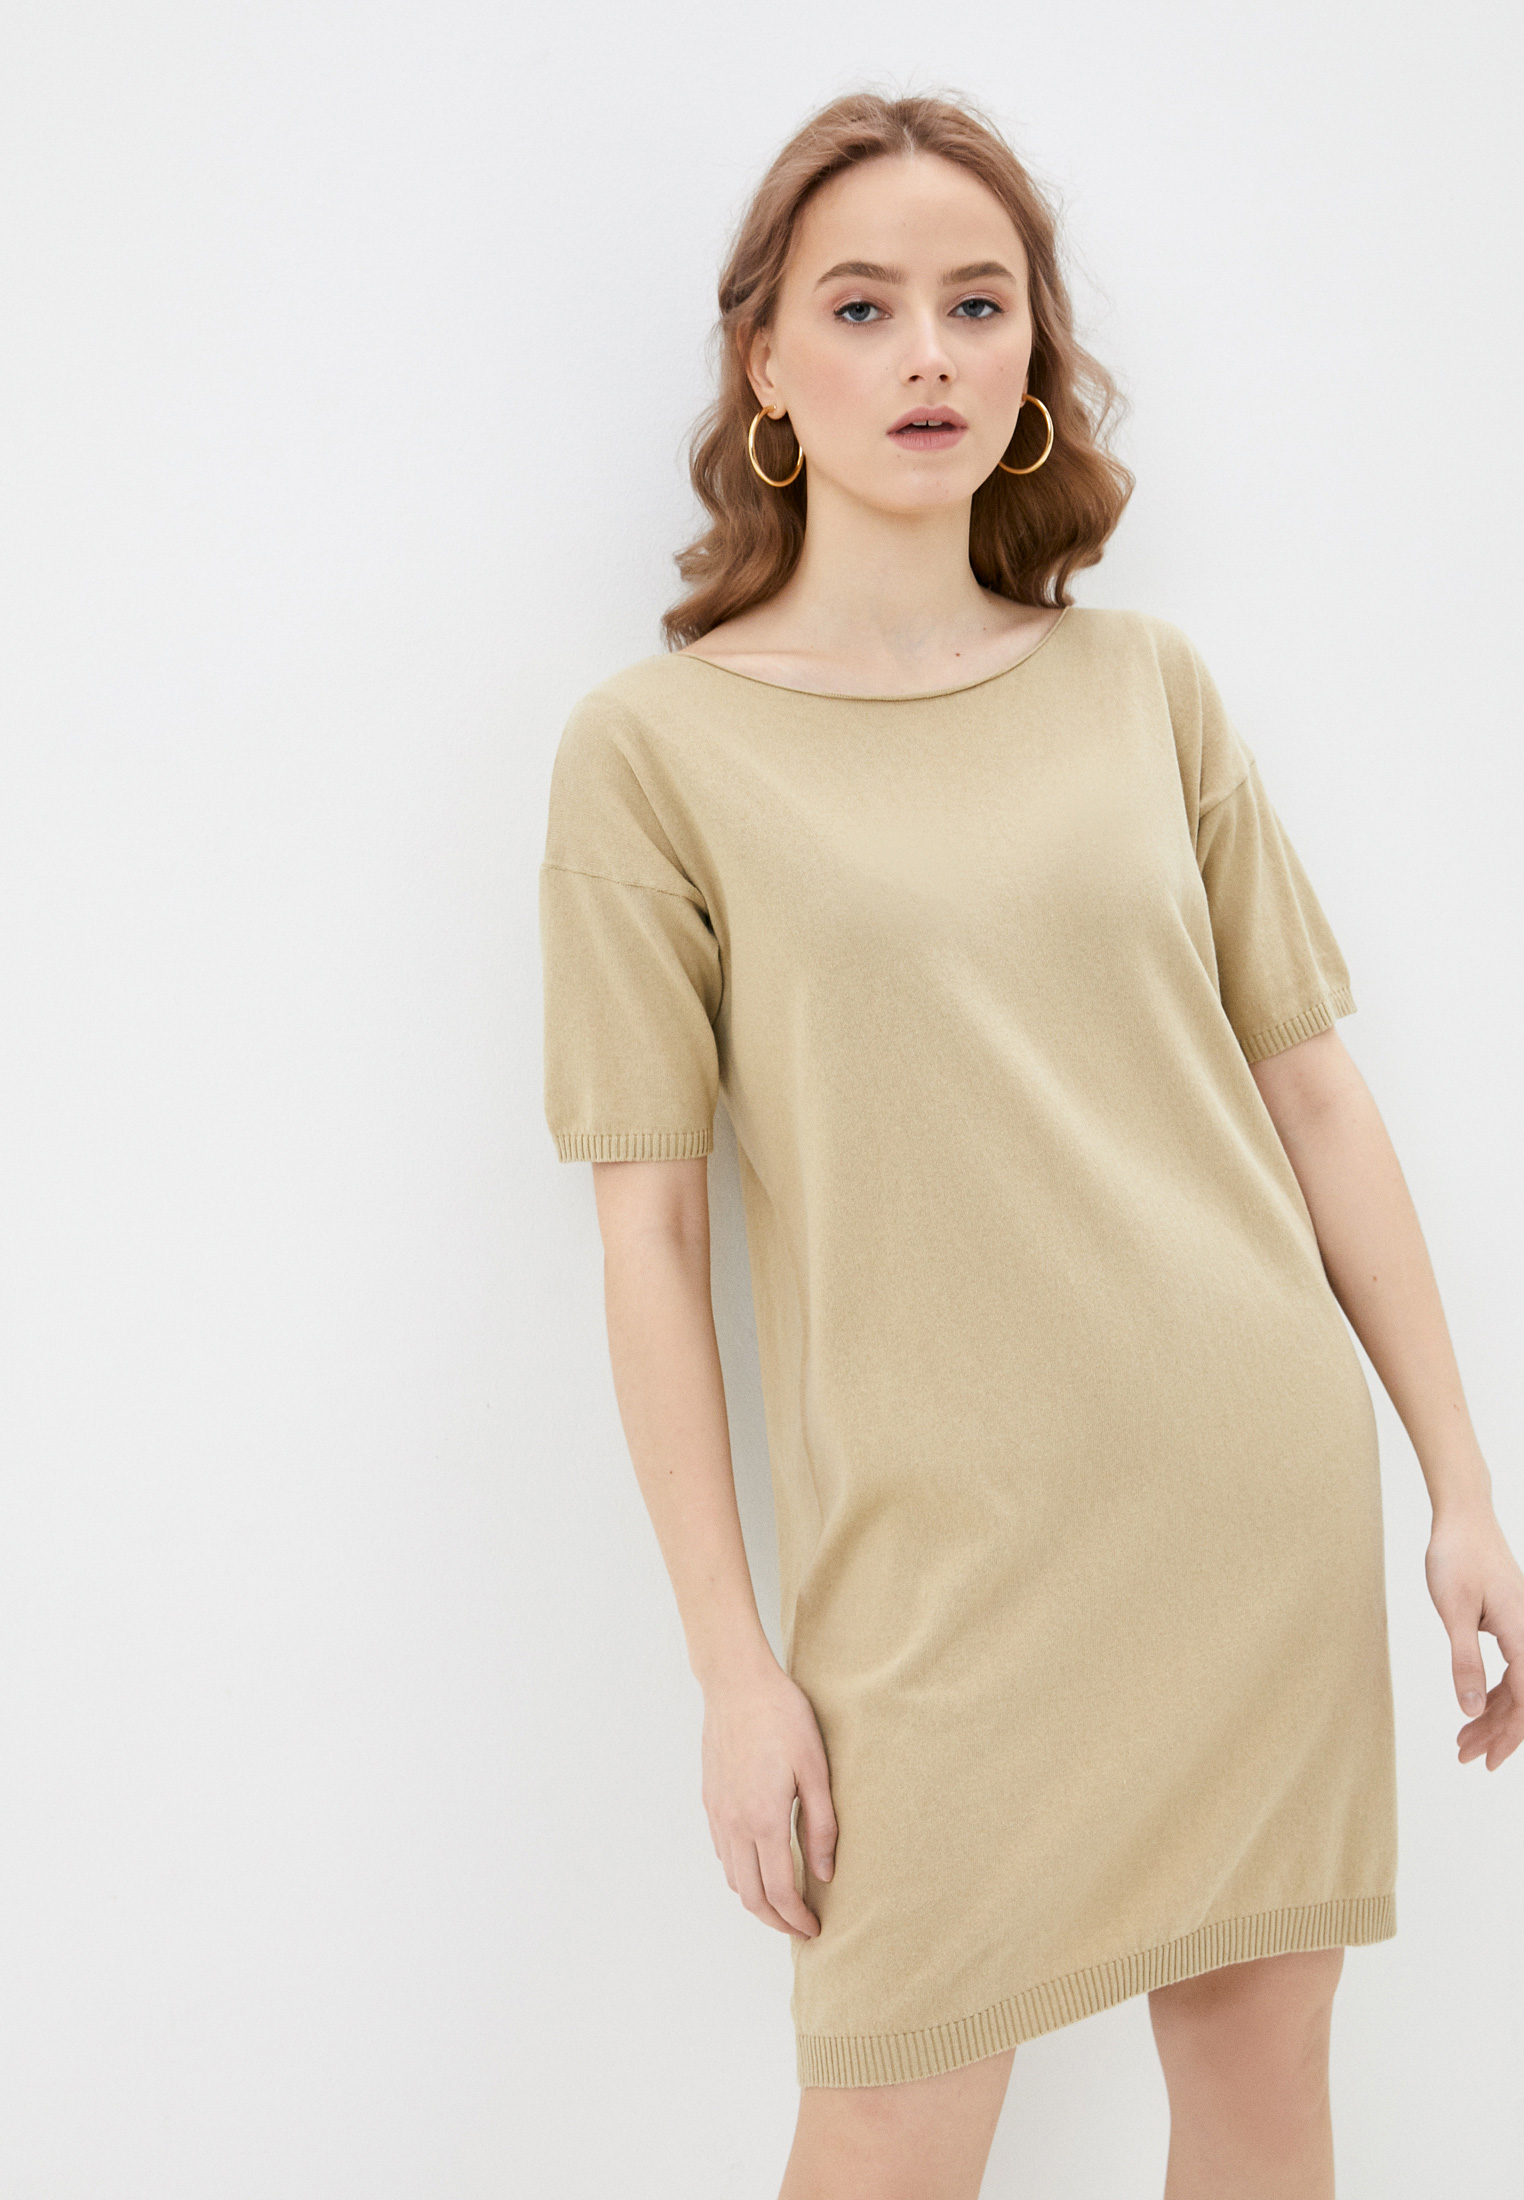 Вязаное платье United Colors of Benetton (Юнайтед Колорс оф Бенеттон) 1028V1O65